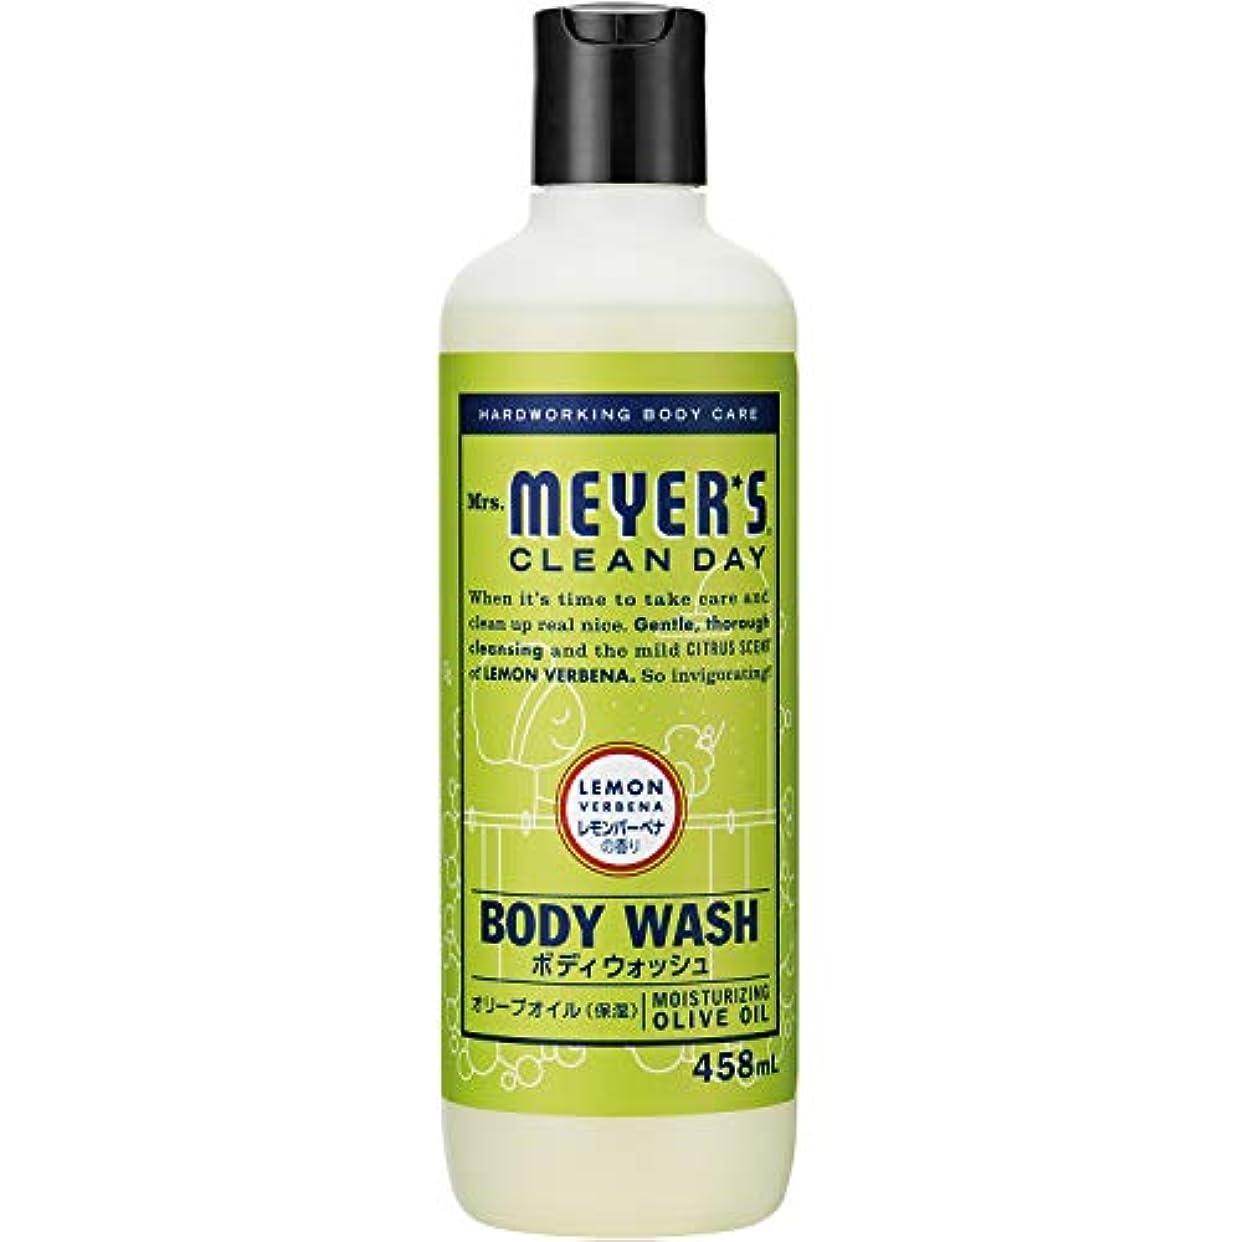 Mrs. MEYER'S CLEAN DAY(ミセスマイヤーズ クリーンデイ) ミセスマイヤーズ クリーンデイ(Mrs.Meyers Clean Day) ボディウォッシュ レモンバーベナの香り 458ml ボディソープ